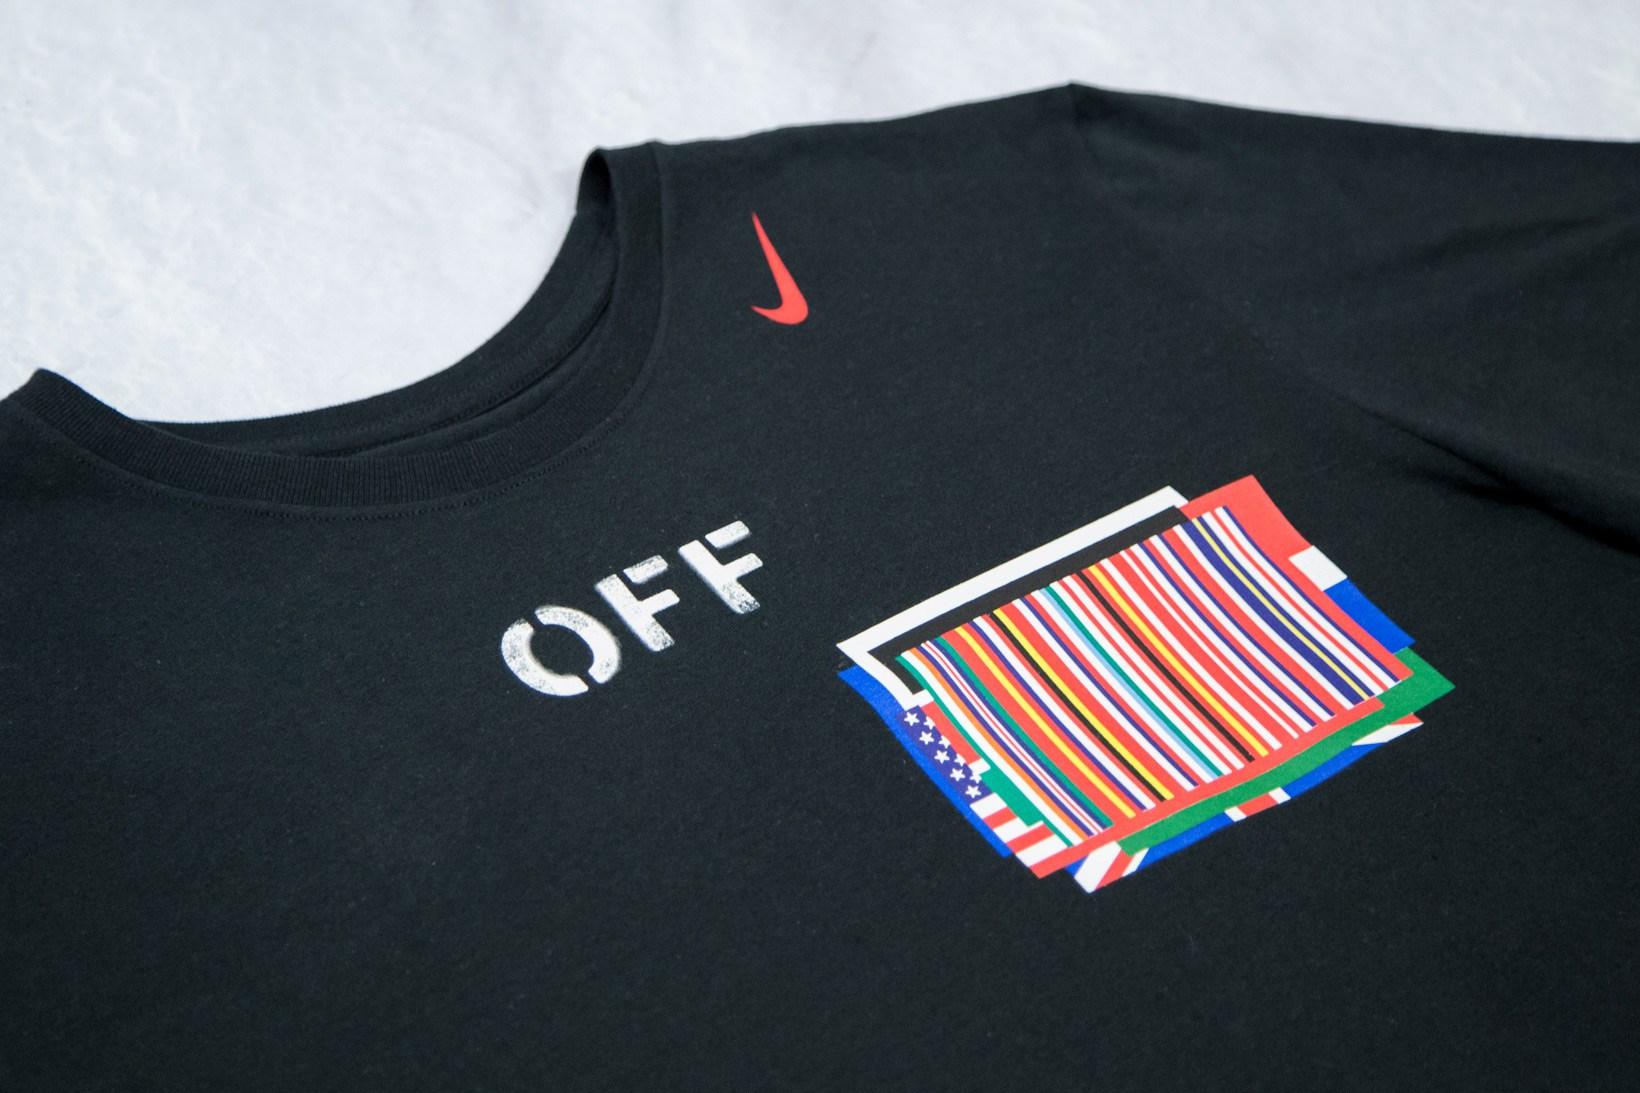 nike-off-white-virgil-abloh-equality-t-shirt-5-2